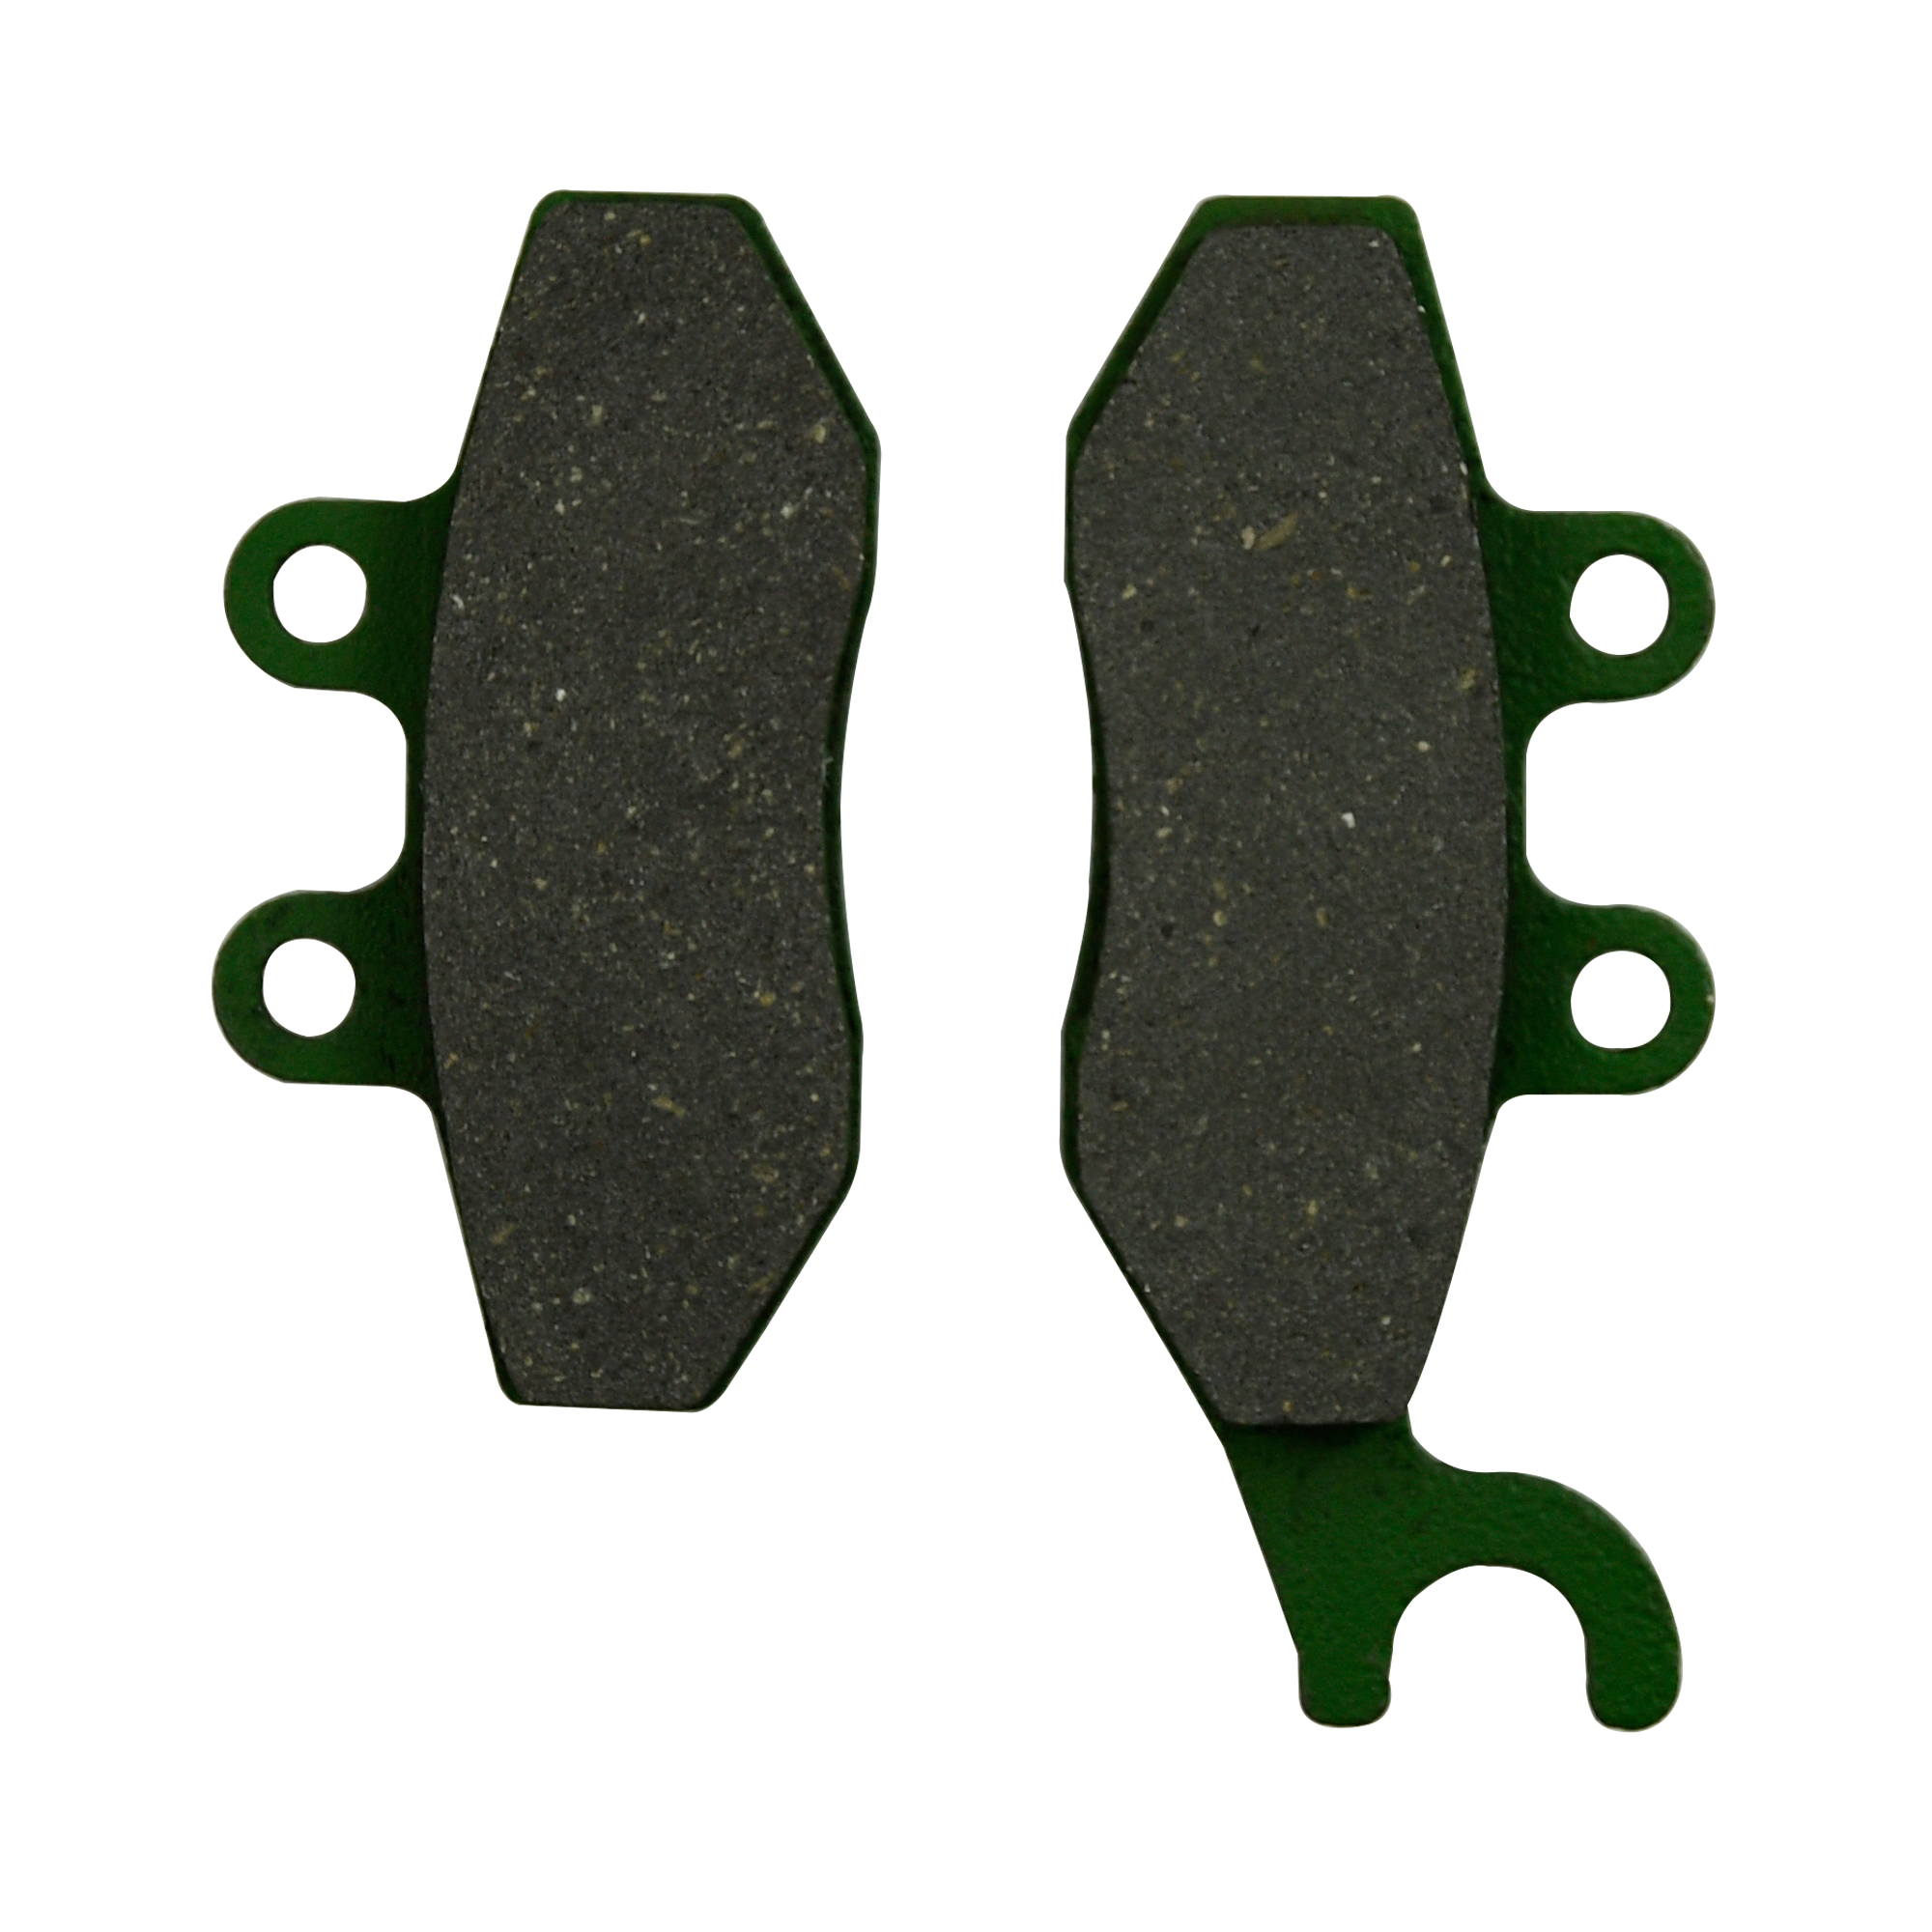 Armstrong GG Range Road Front / Rear Brake Pads - #230408